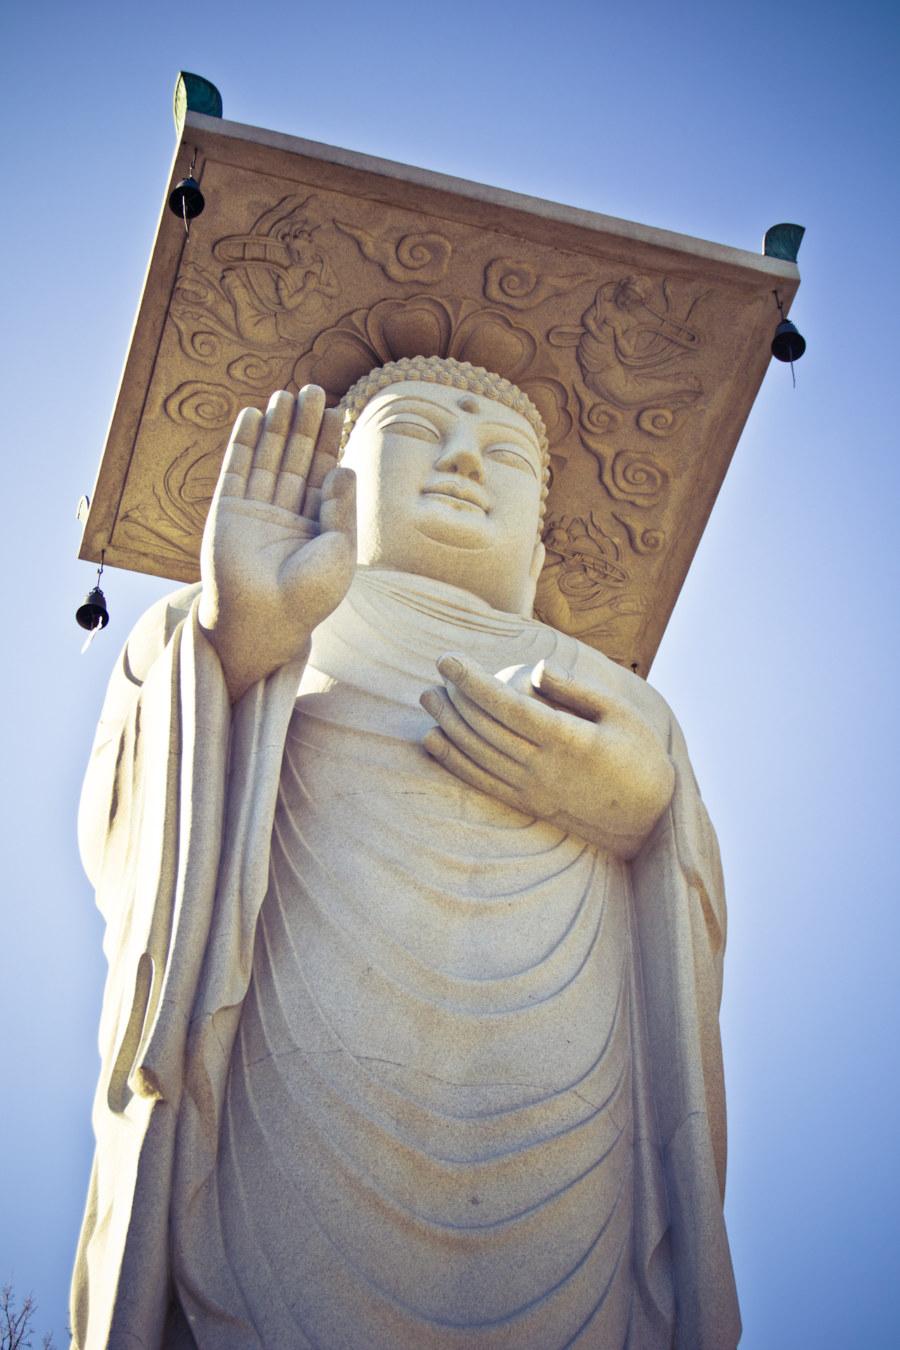 Bonguensa Temple Buddha Statue